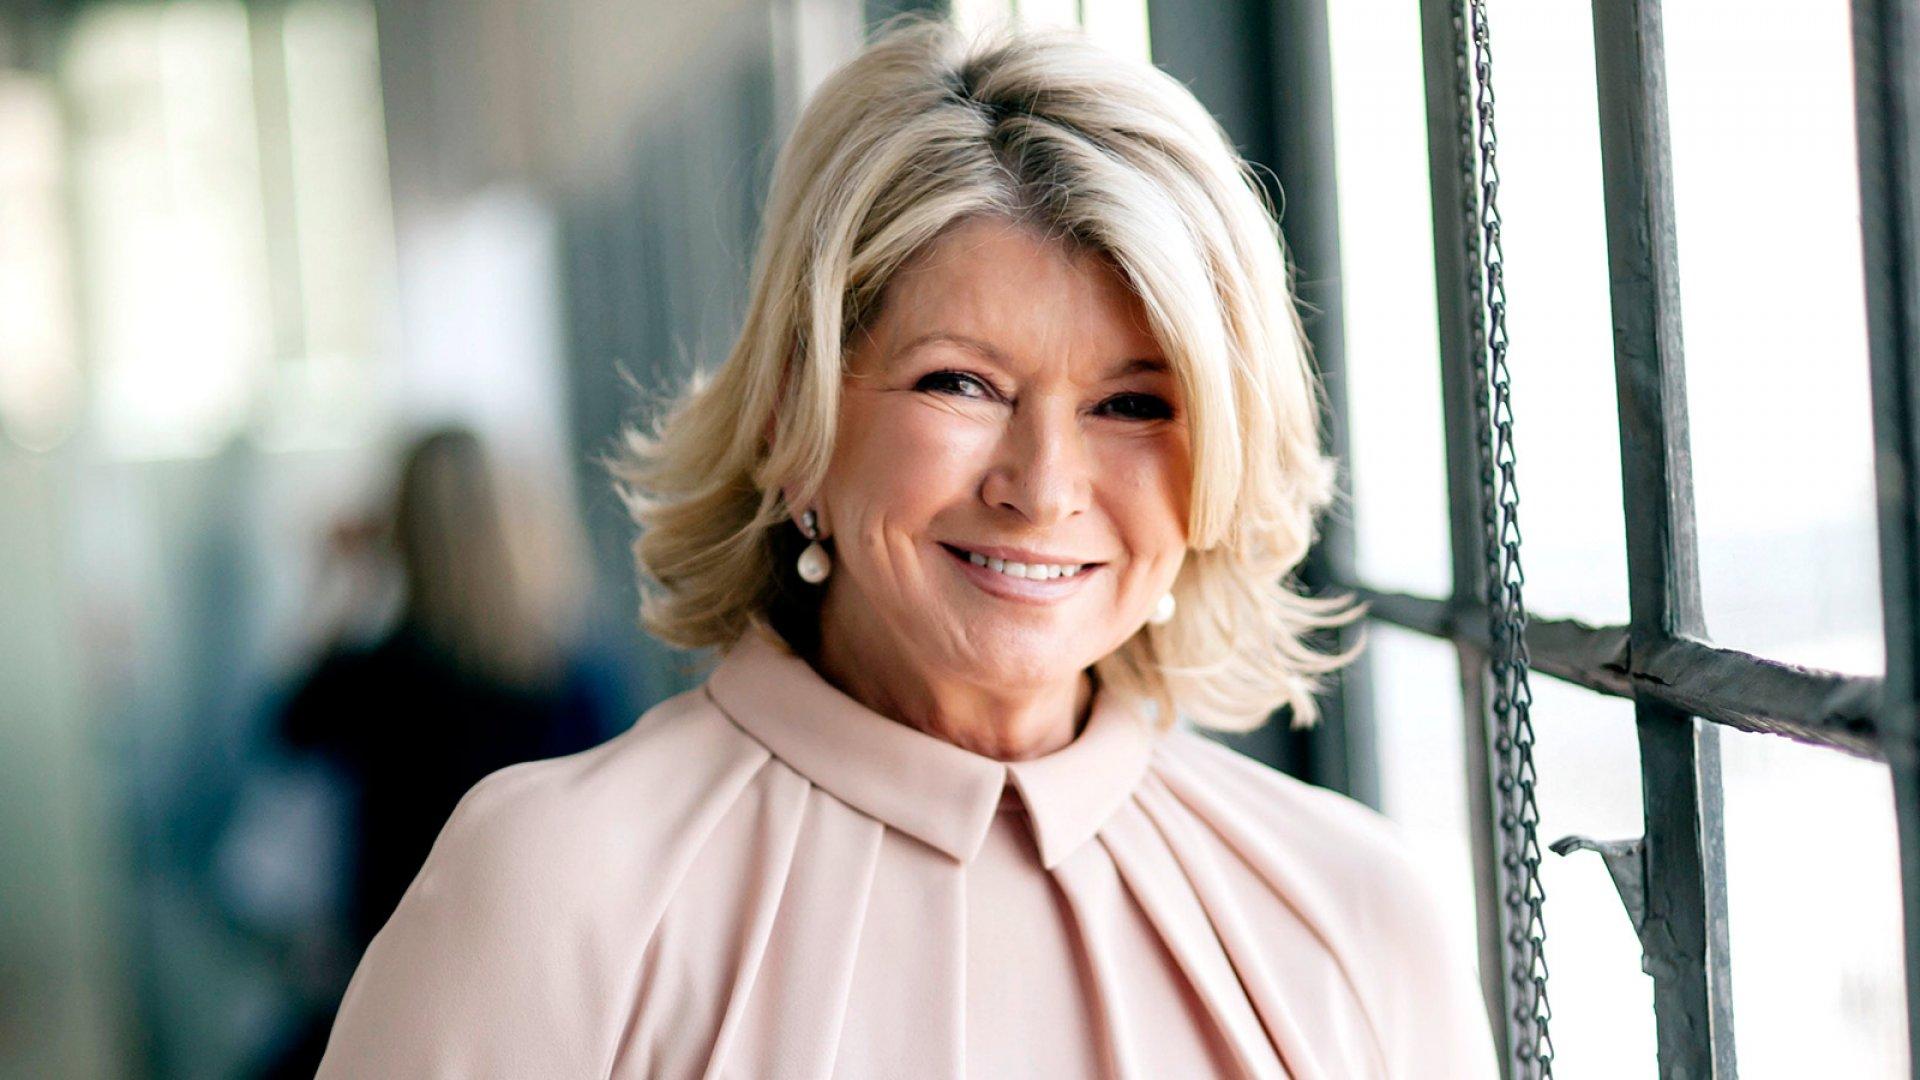 Martha Stewart Unloads on Millennials: Here's What She Said(and Why)